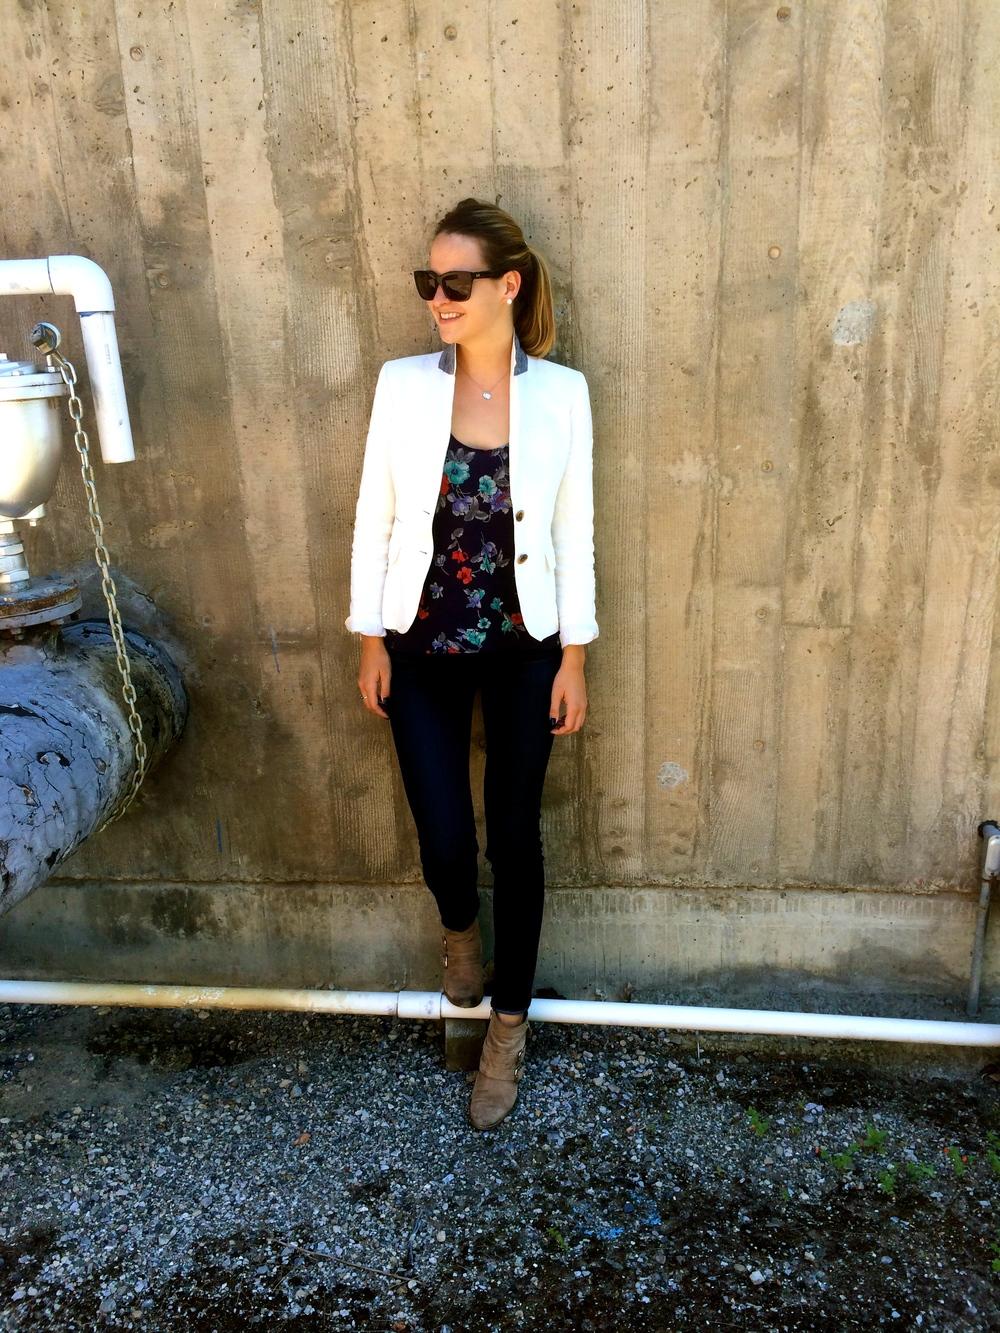 Glasses: Dolce & Gabbana Blazer: J.Crew Tank: Urban Outfitters Jeans: Adriana Goldschmiedt Booties: Dolce Vita Necklace: Tiffany